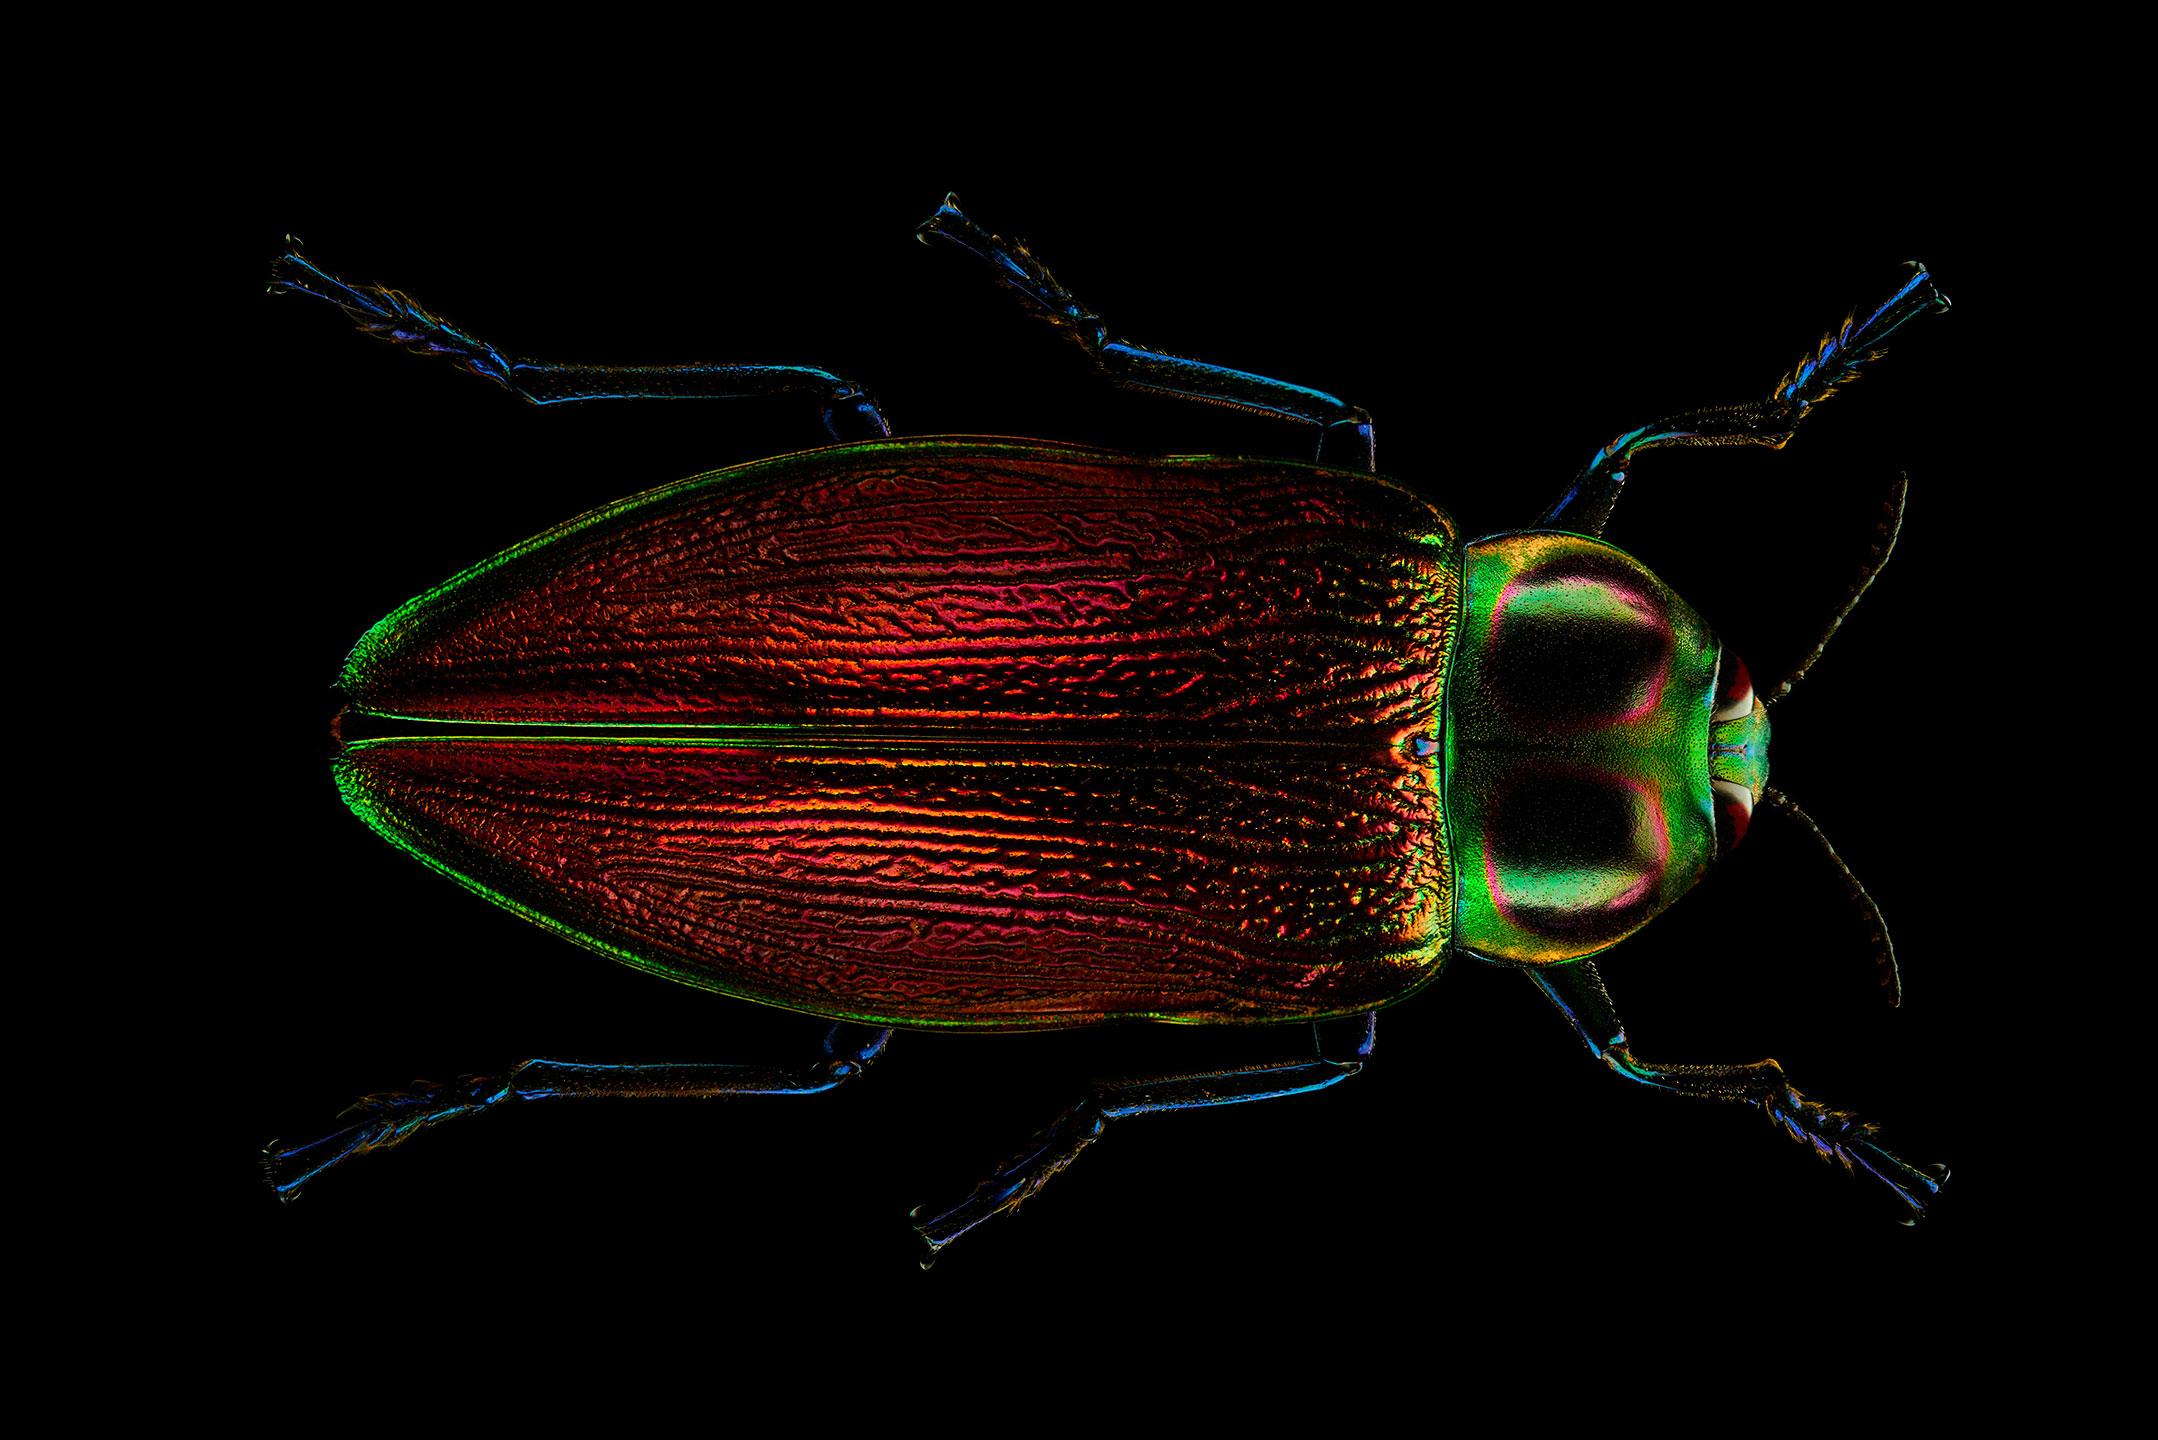 "<a href=""//mrsteel.london/shop/jewel-beetle/"">REVEAL DETAILS / BUY</a>"